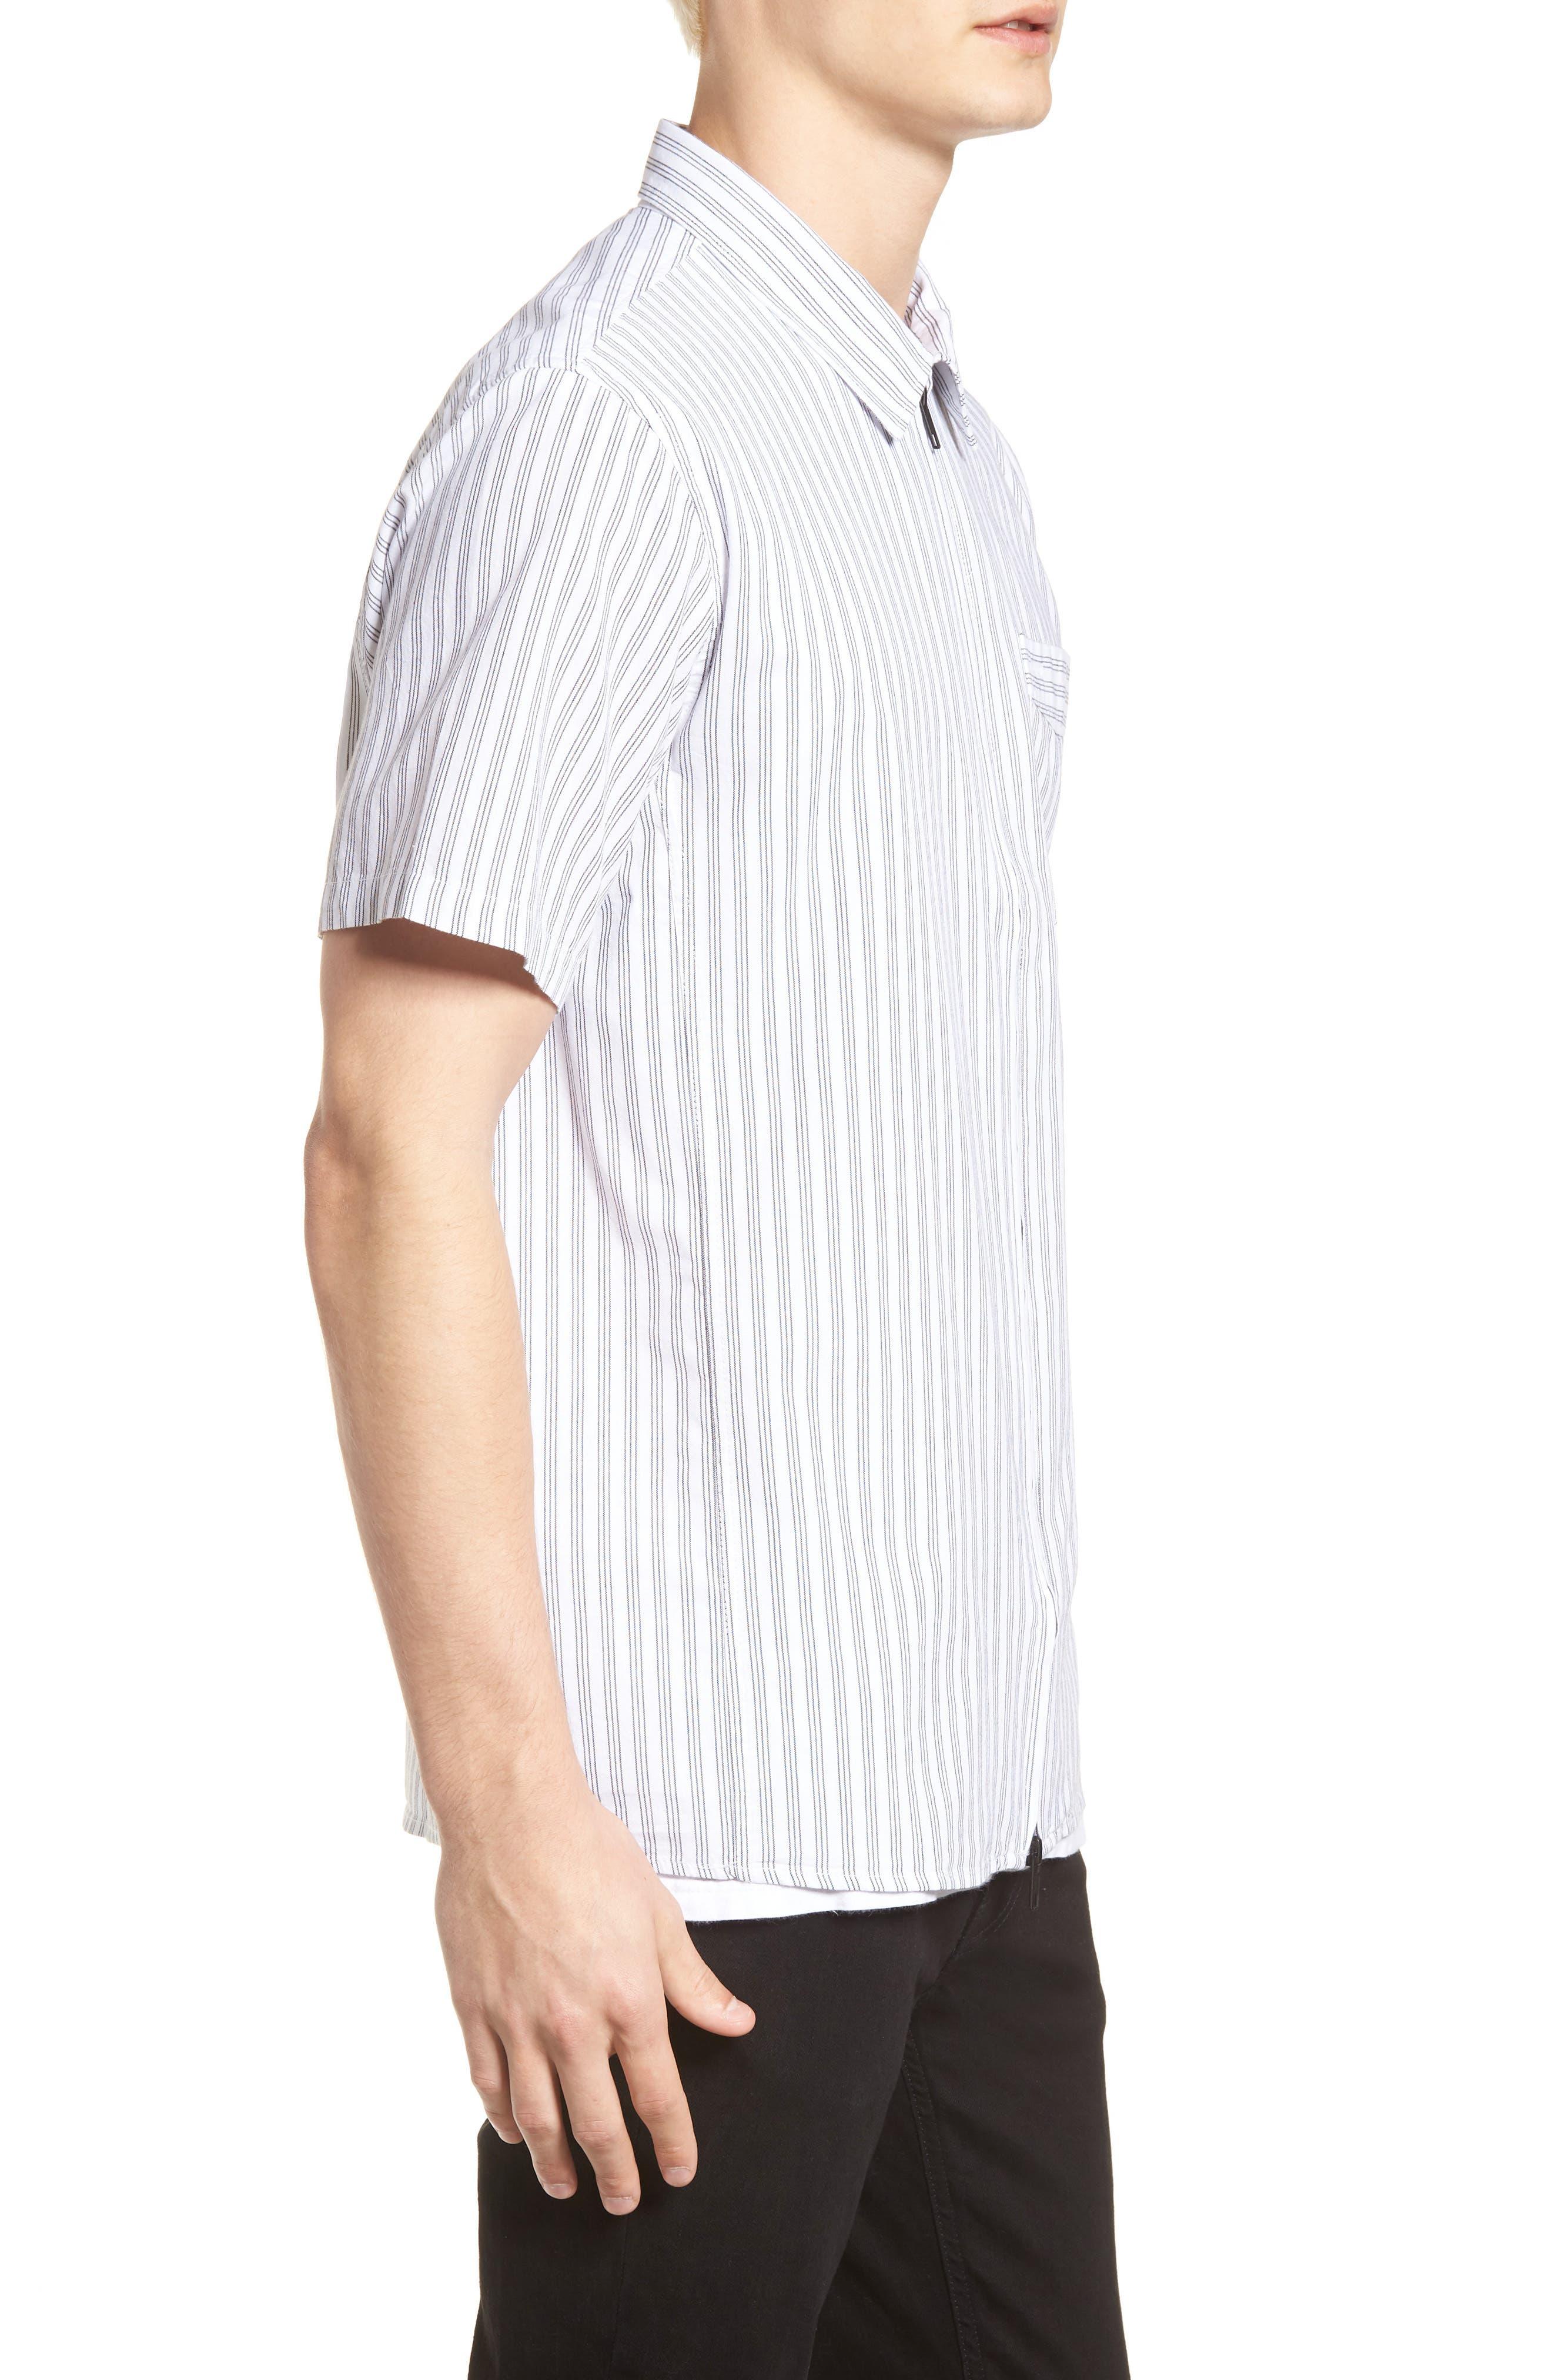 Rollins Woven Shirt,                             Alternate thumbnail 3, color,                             Black/White Stripe